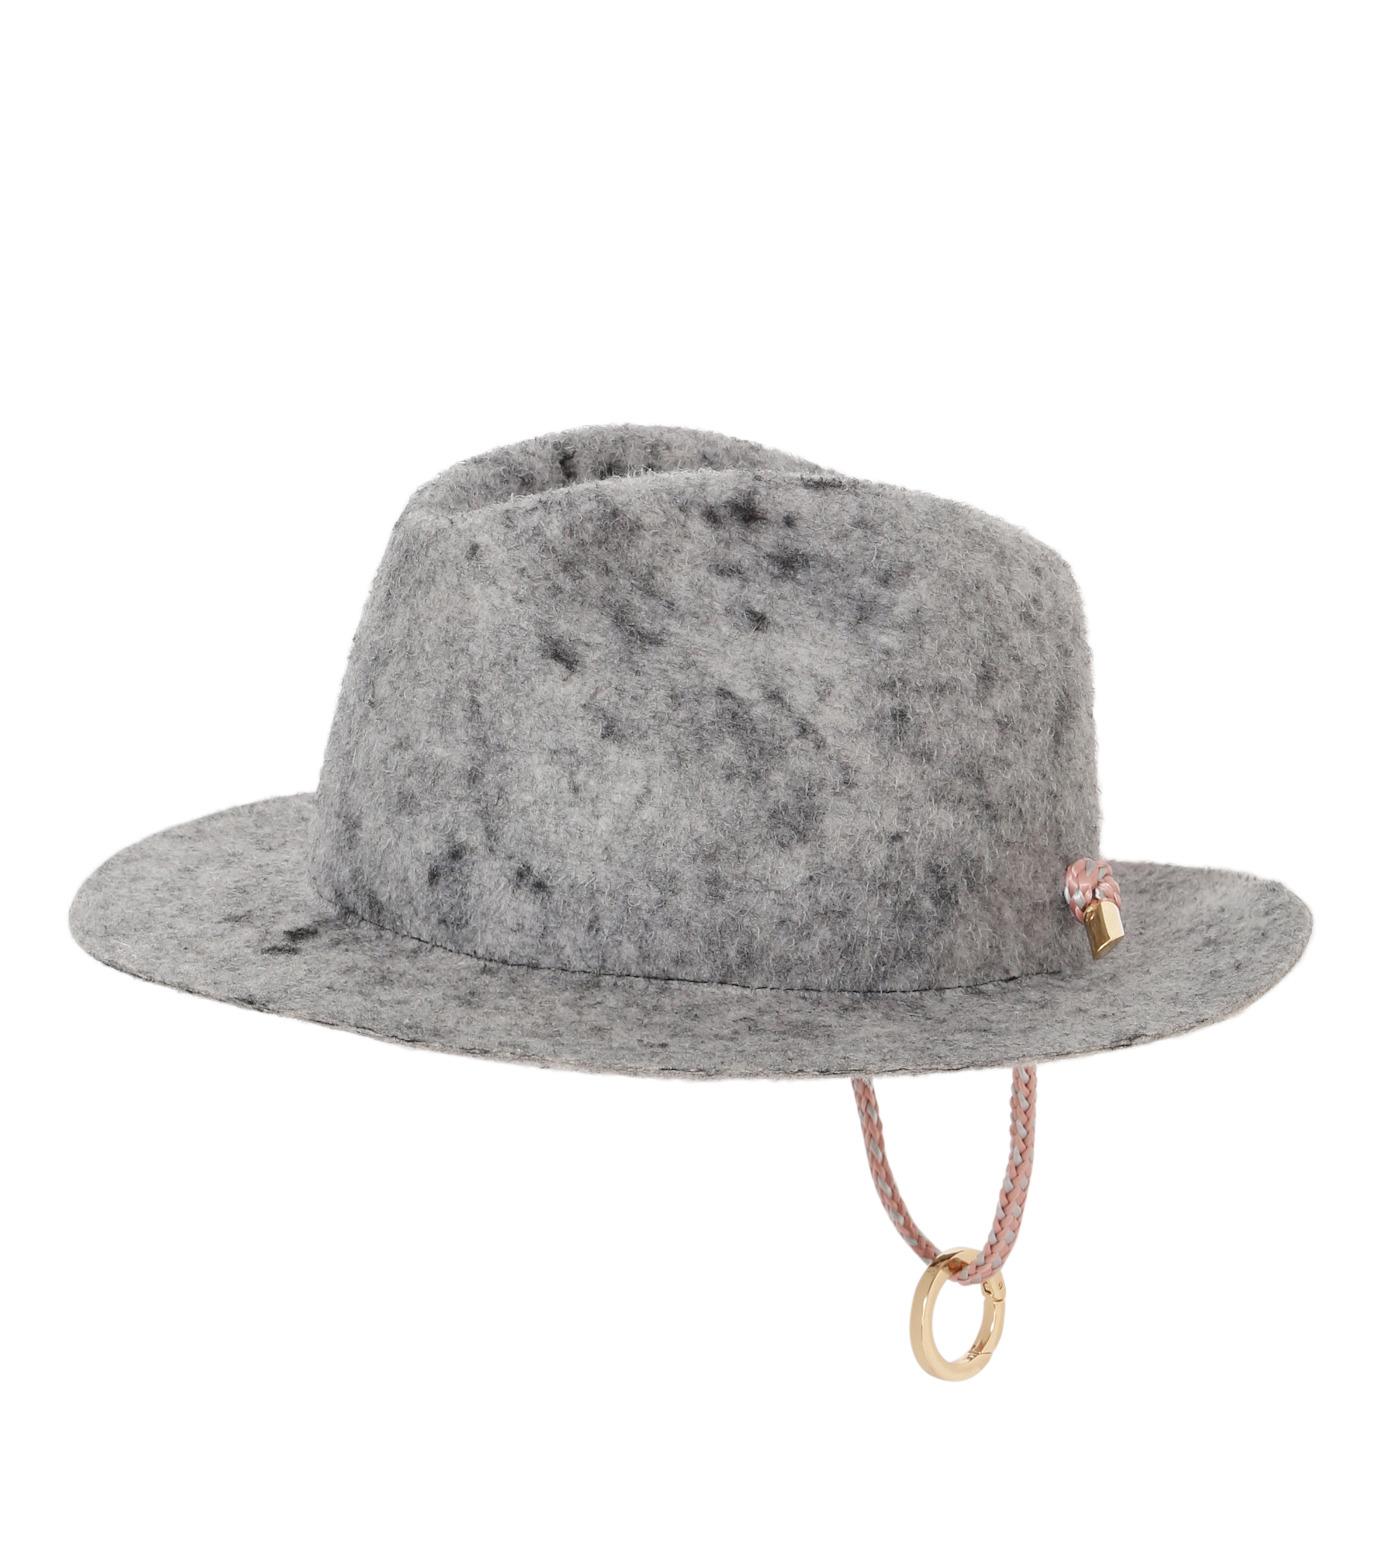 Federica Moretti(フェデリカ モレッティ)のBoiled felt Hat w/Rope-GRAY(キャップ/cap)-CAMO-11 拡大詳細画像1